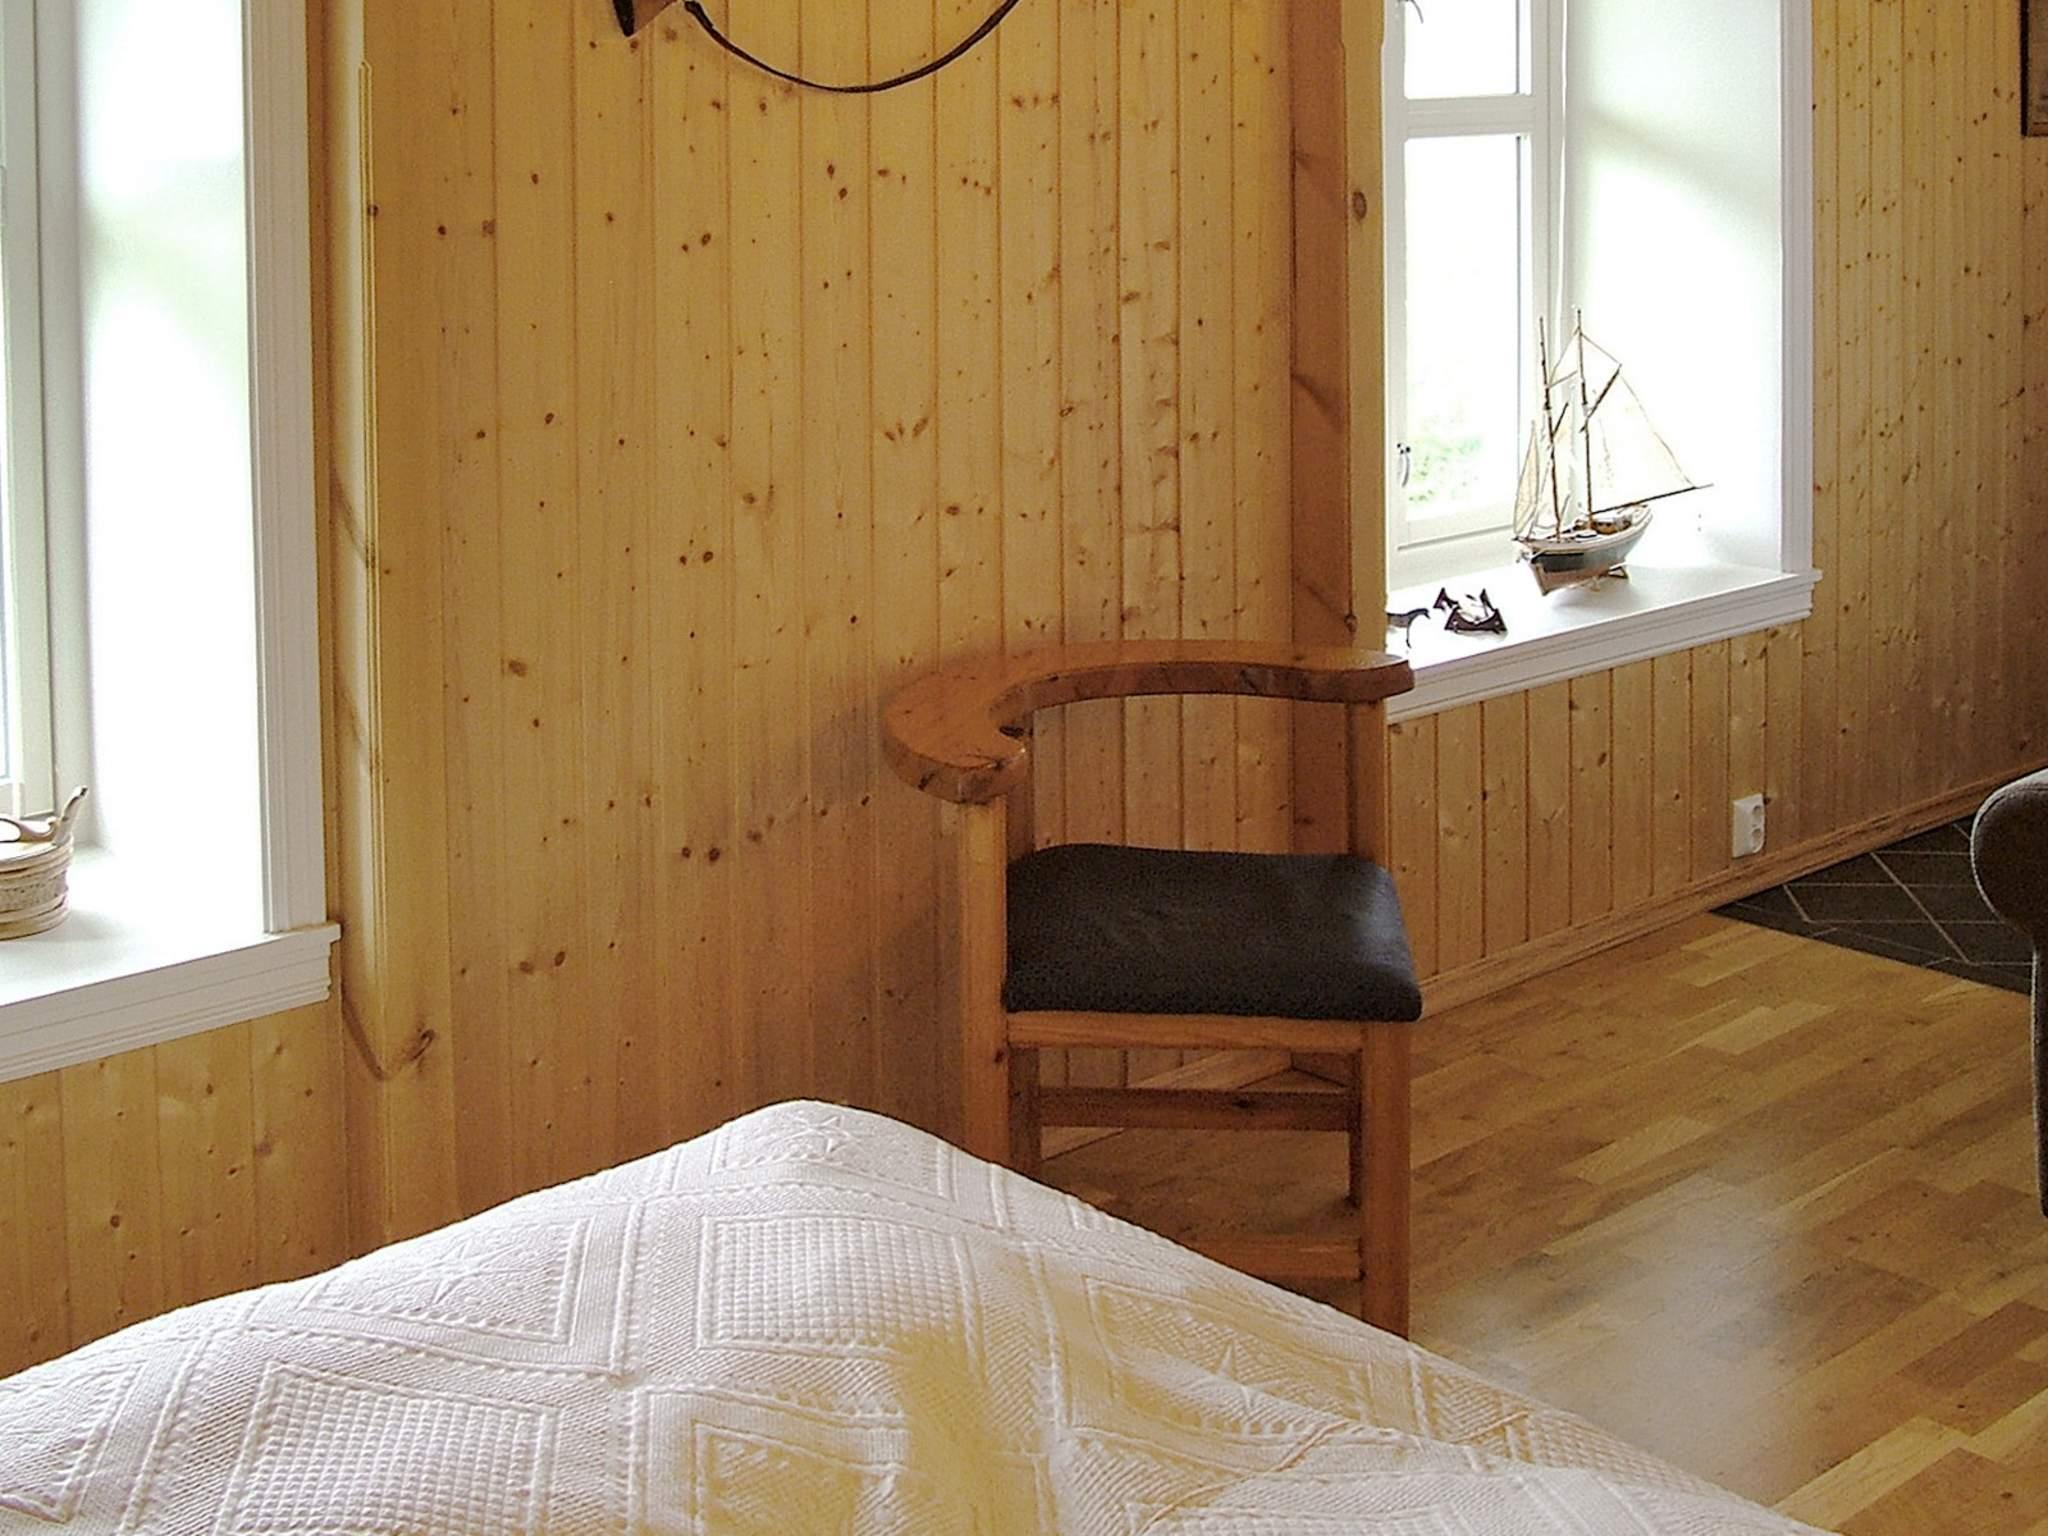 Ferienhaus Tromsø (1707150), Straumsbukta, , Nordnorwegen, Norwegen, Bild 15